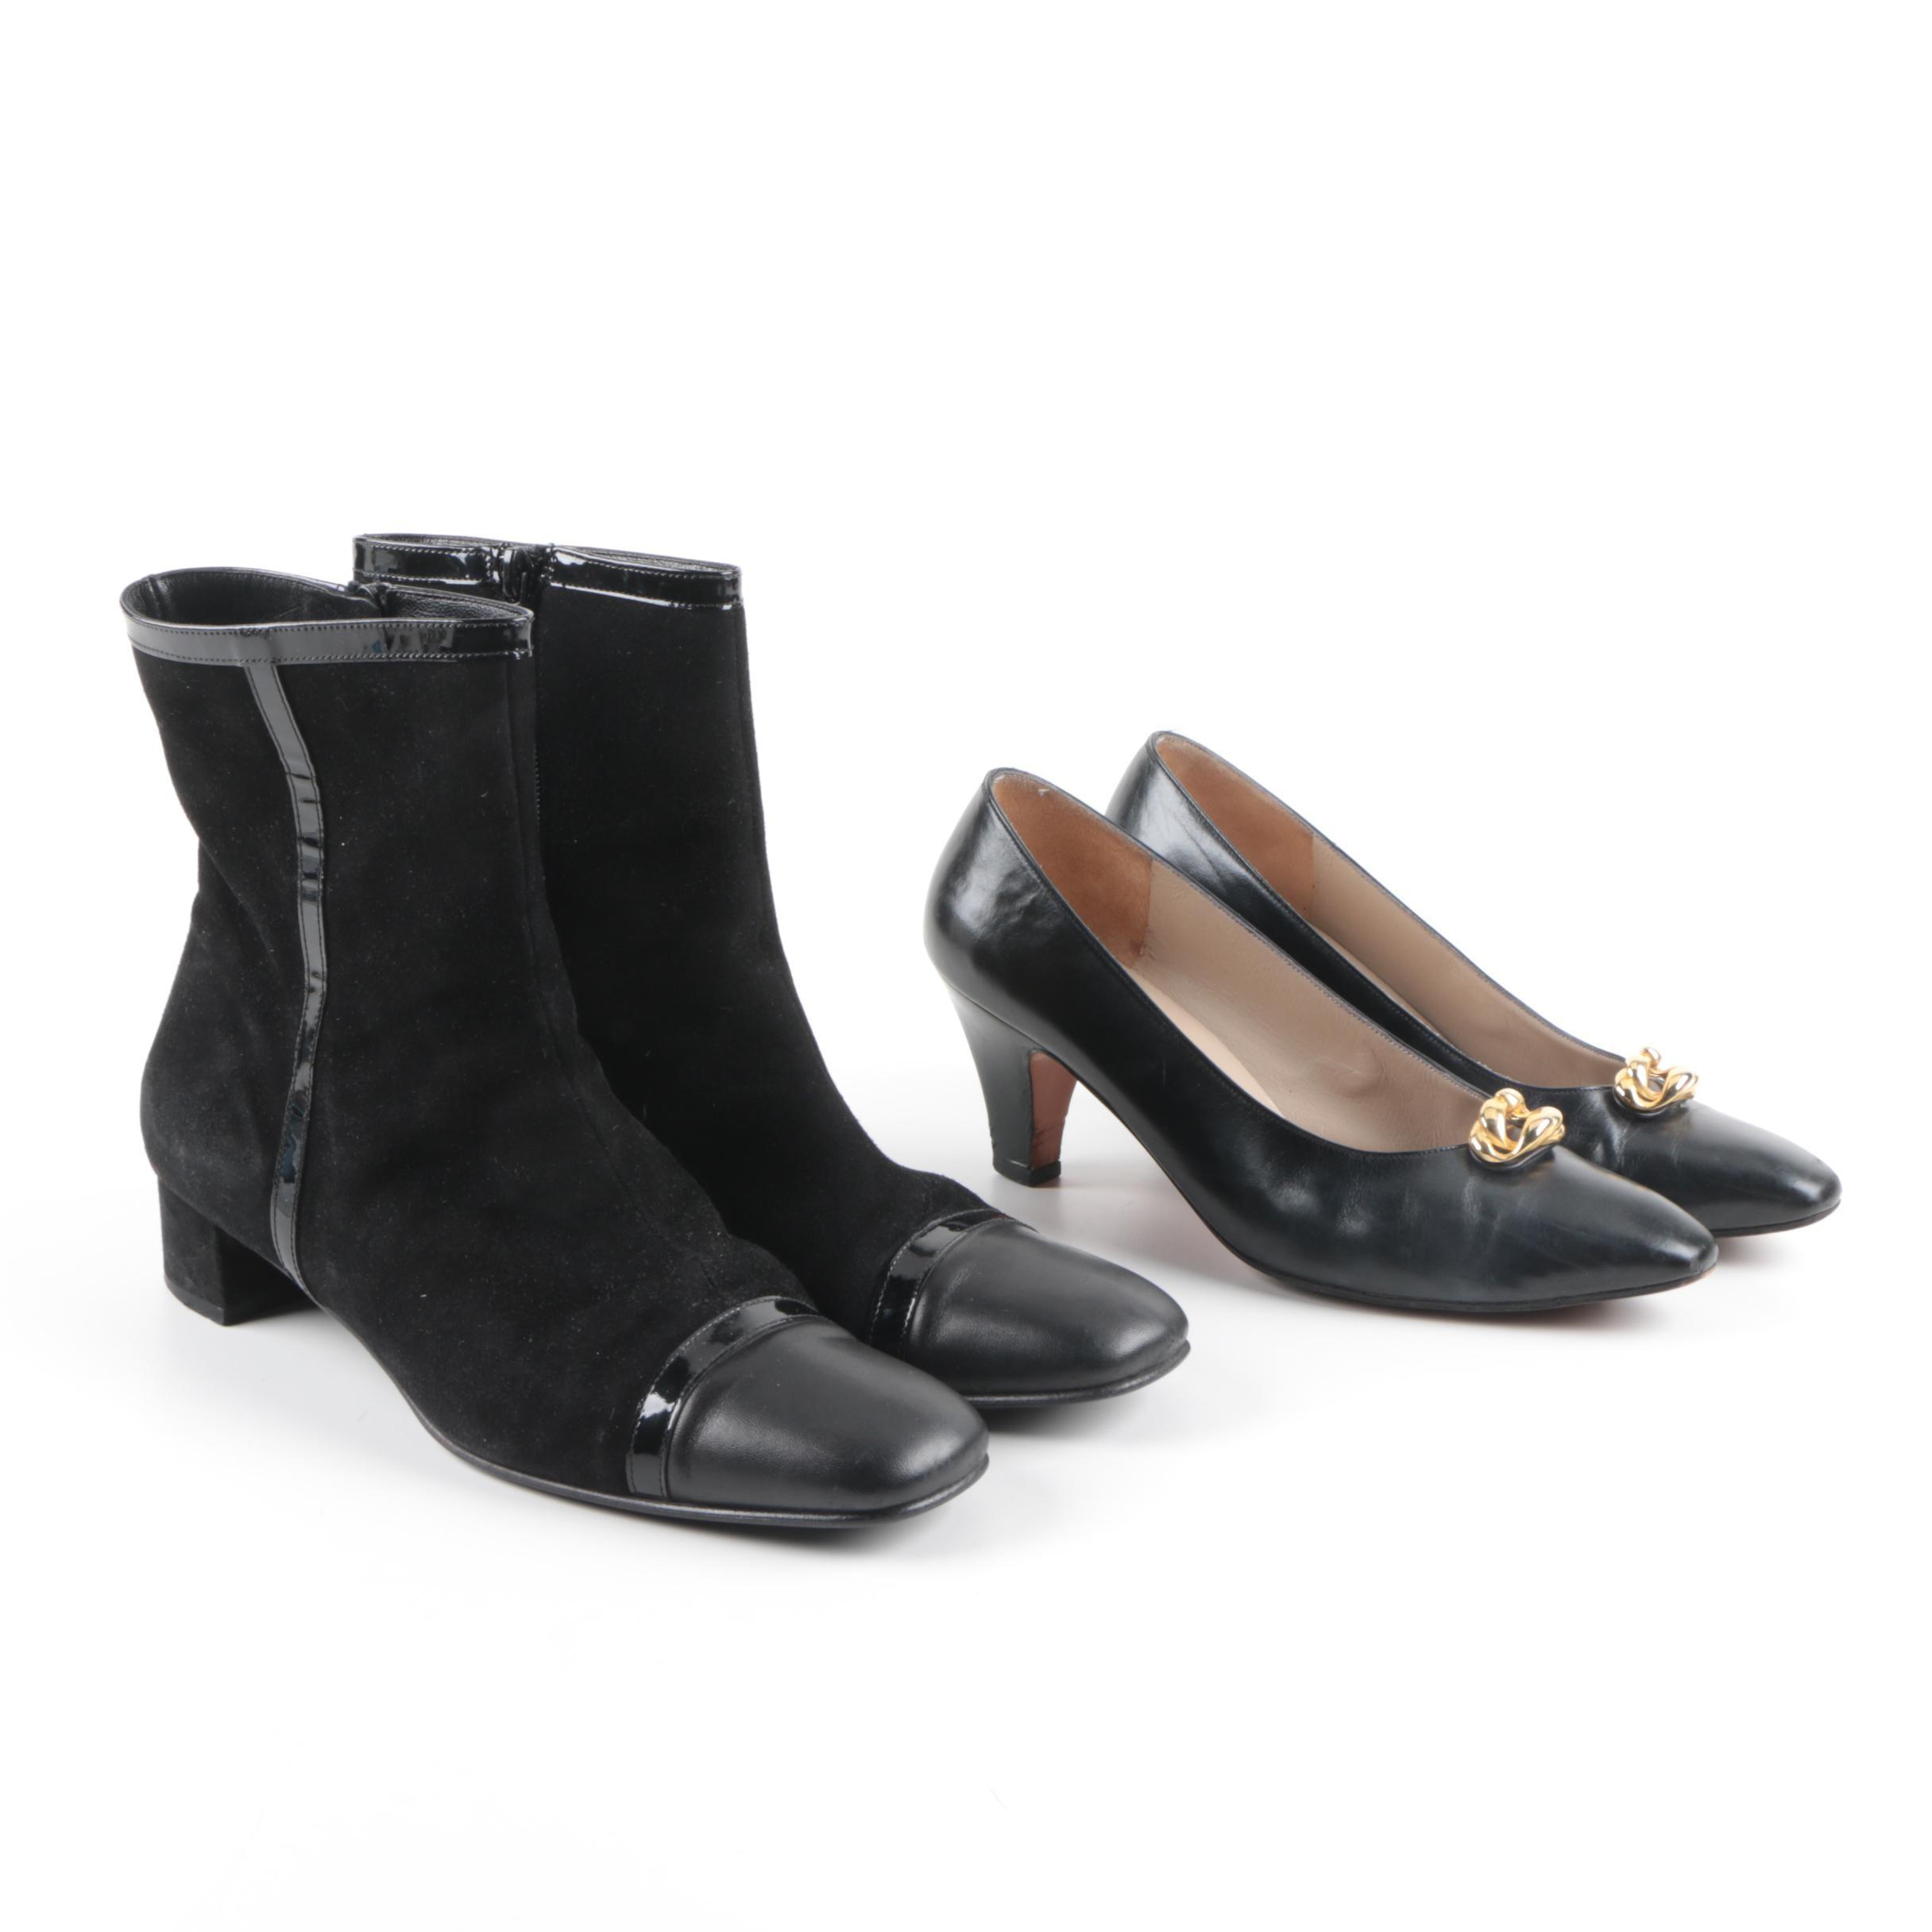 Women's Salvatore Ferragamo Ankle Boots and Pumps